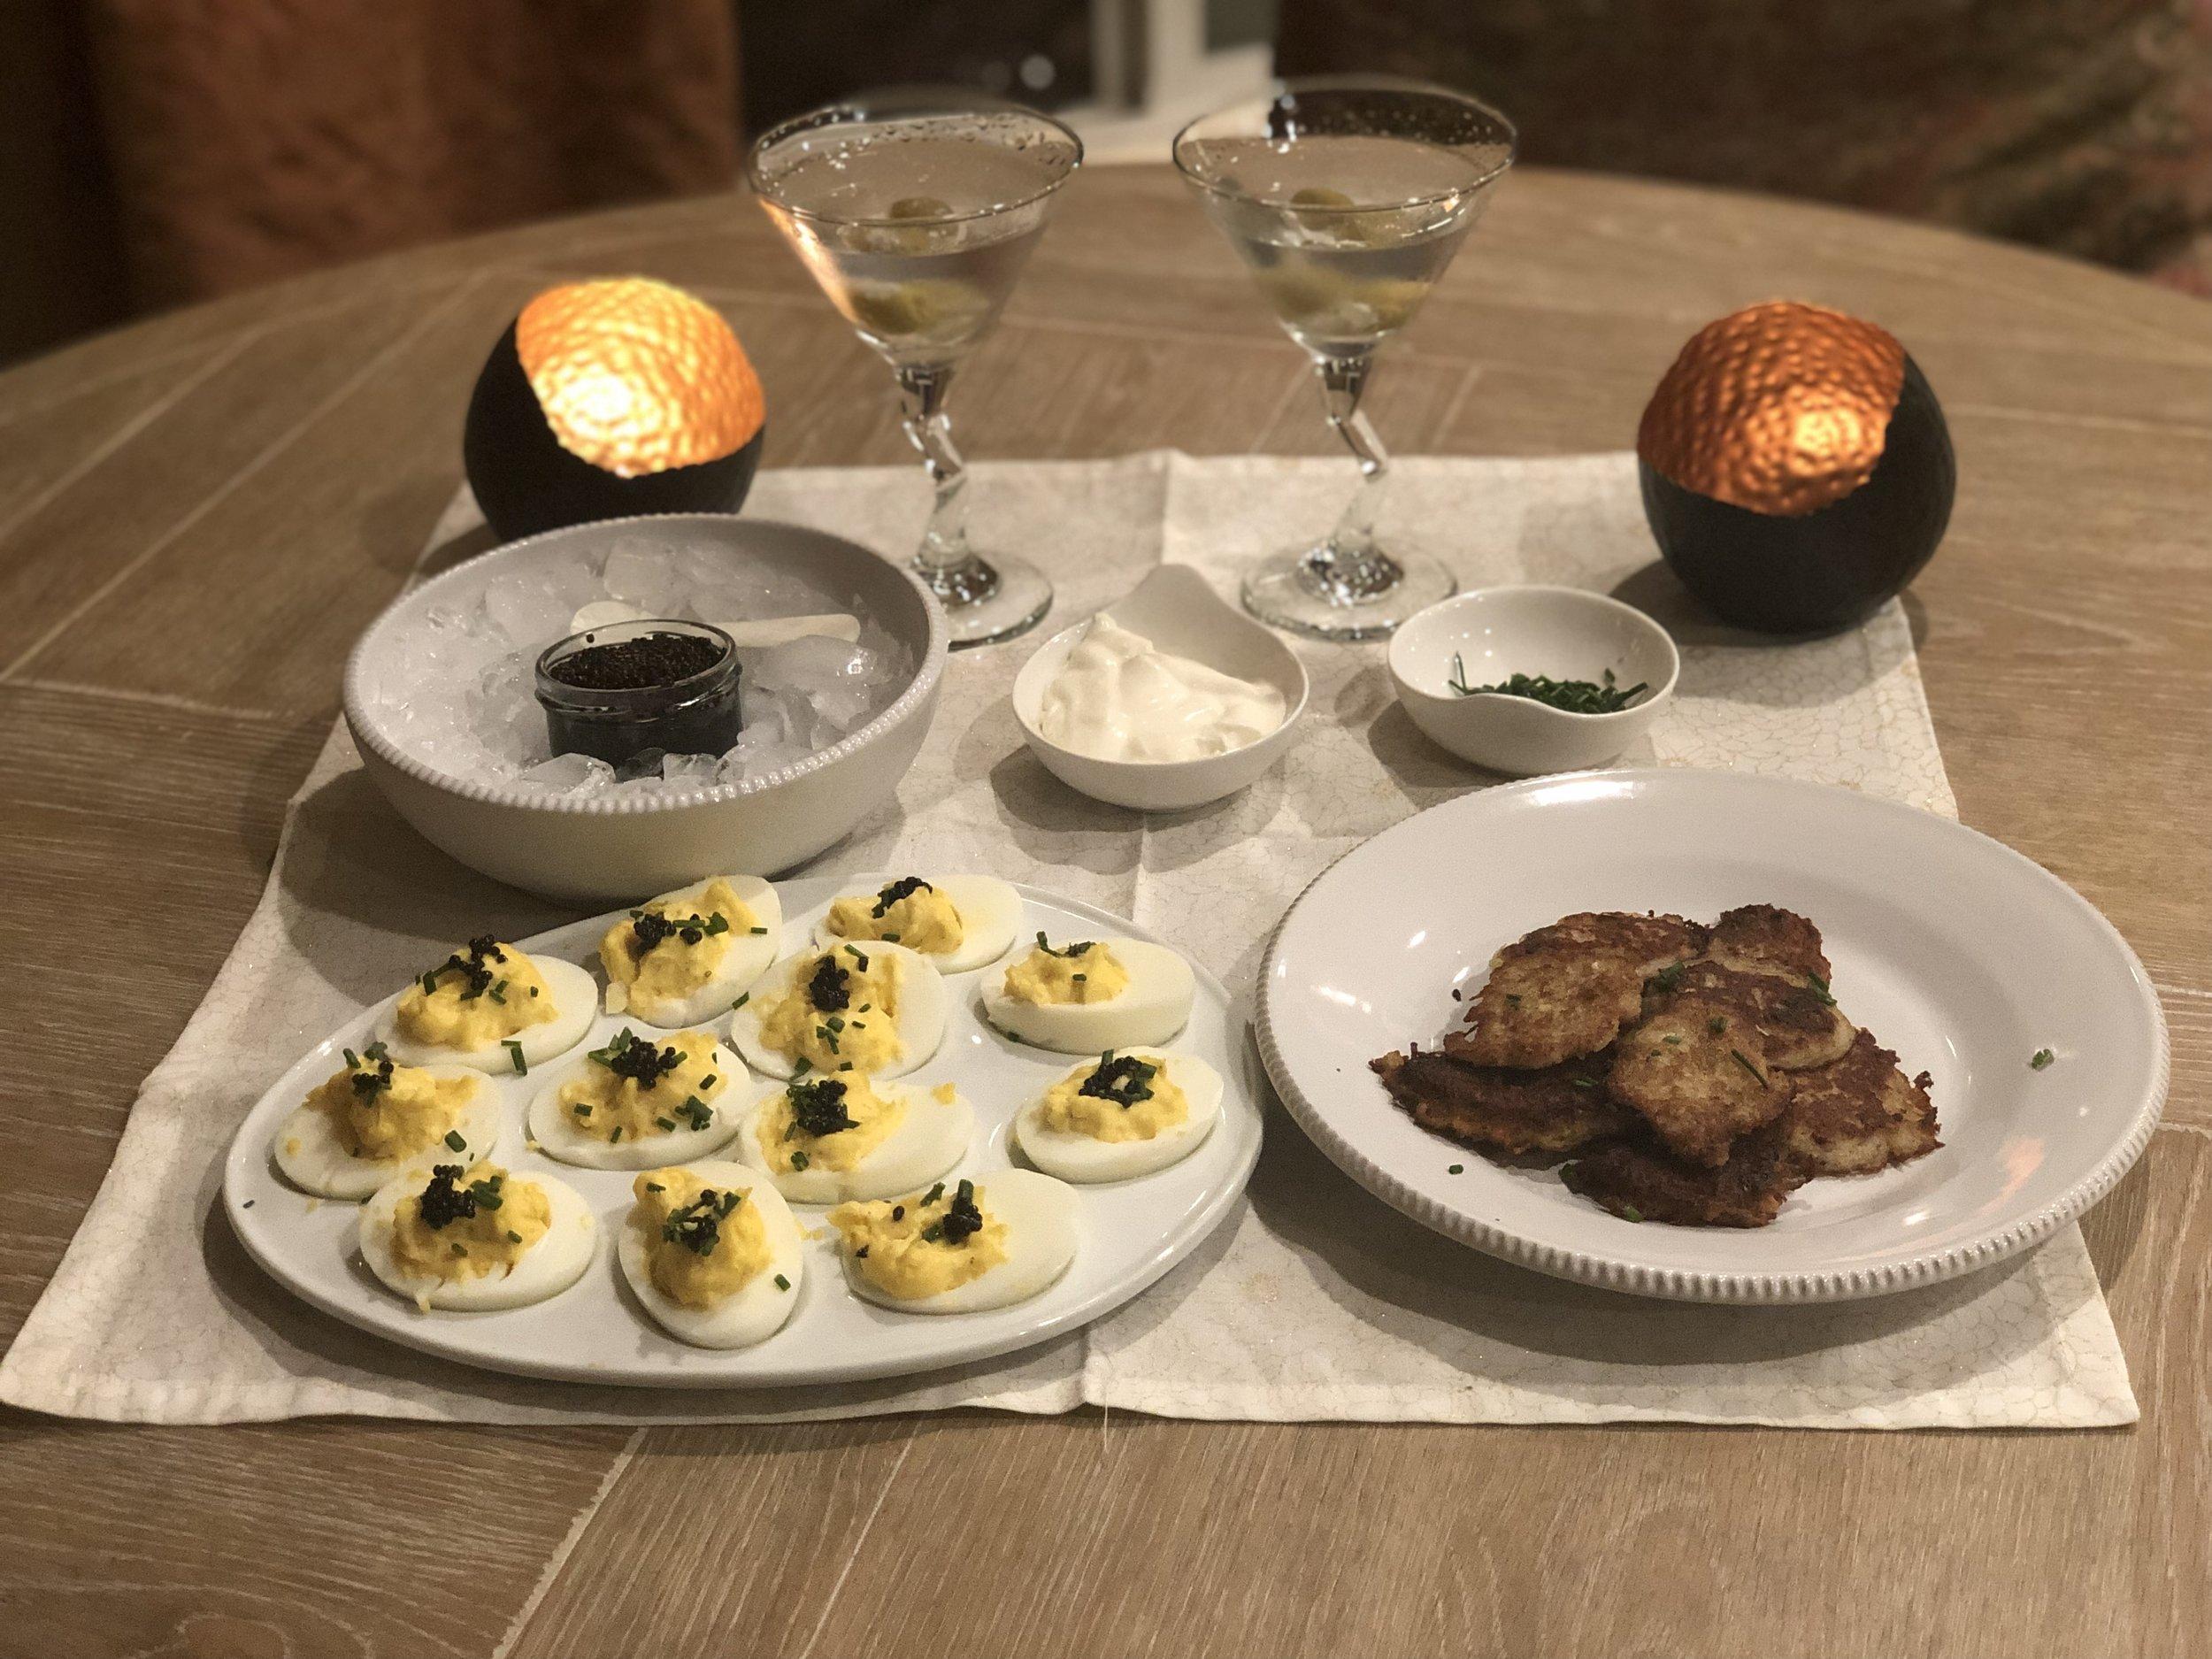 Caviar Deviled Eggs & Latkes - Recipe Coming Soon!